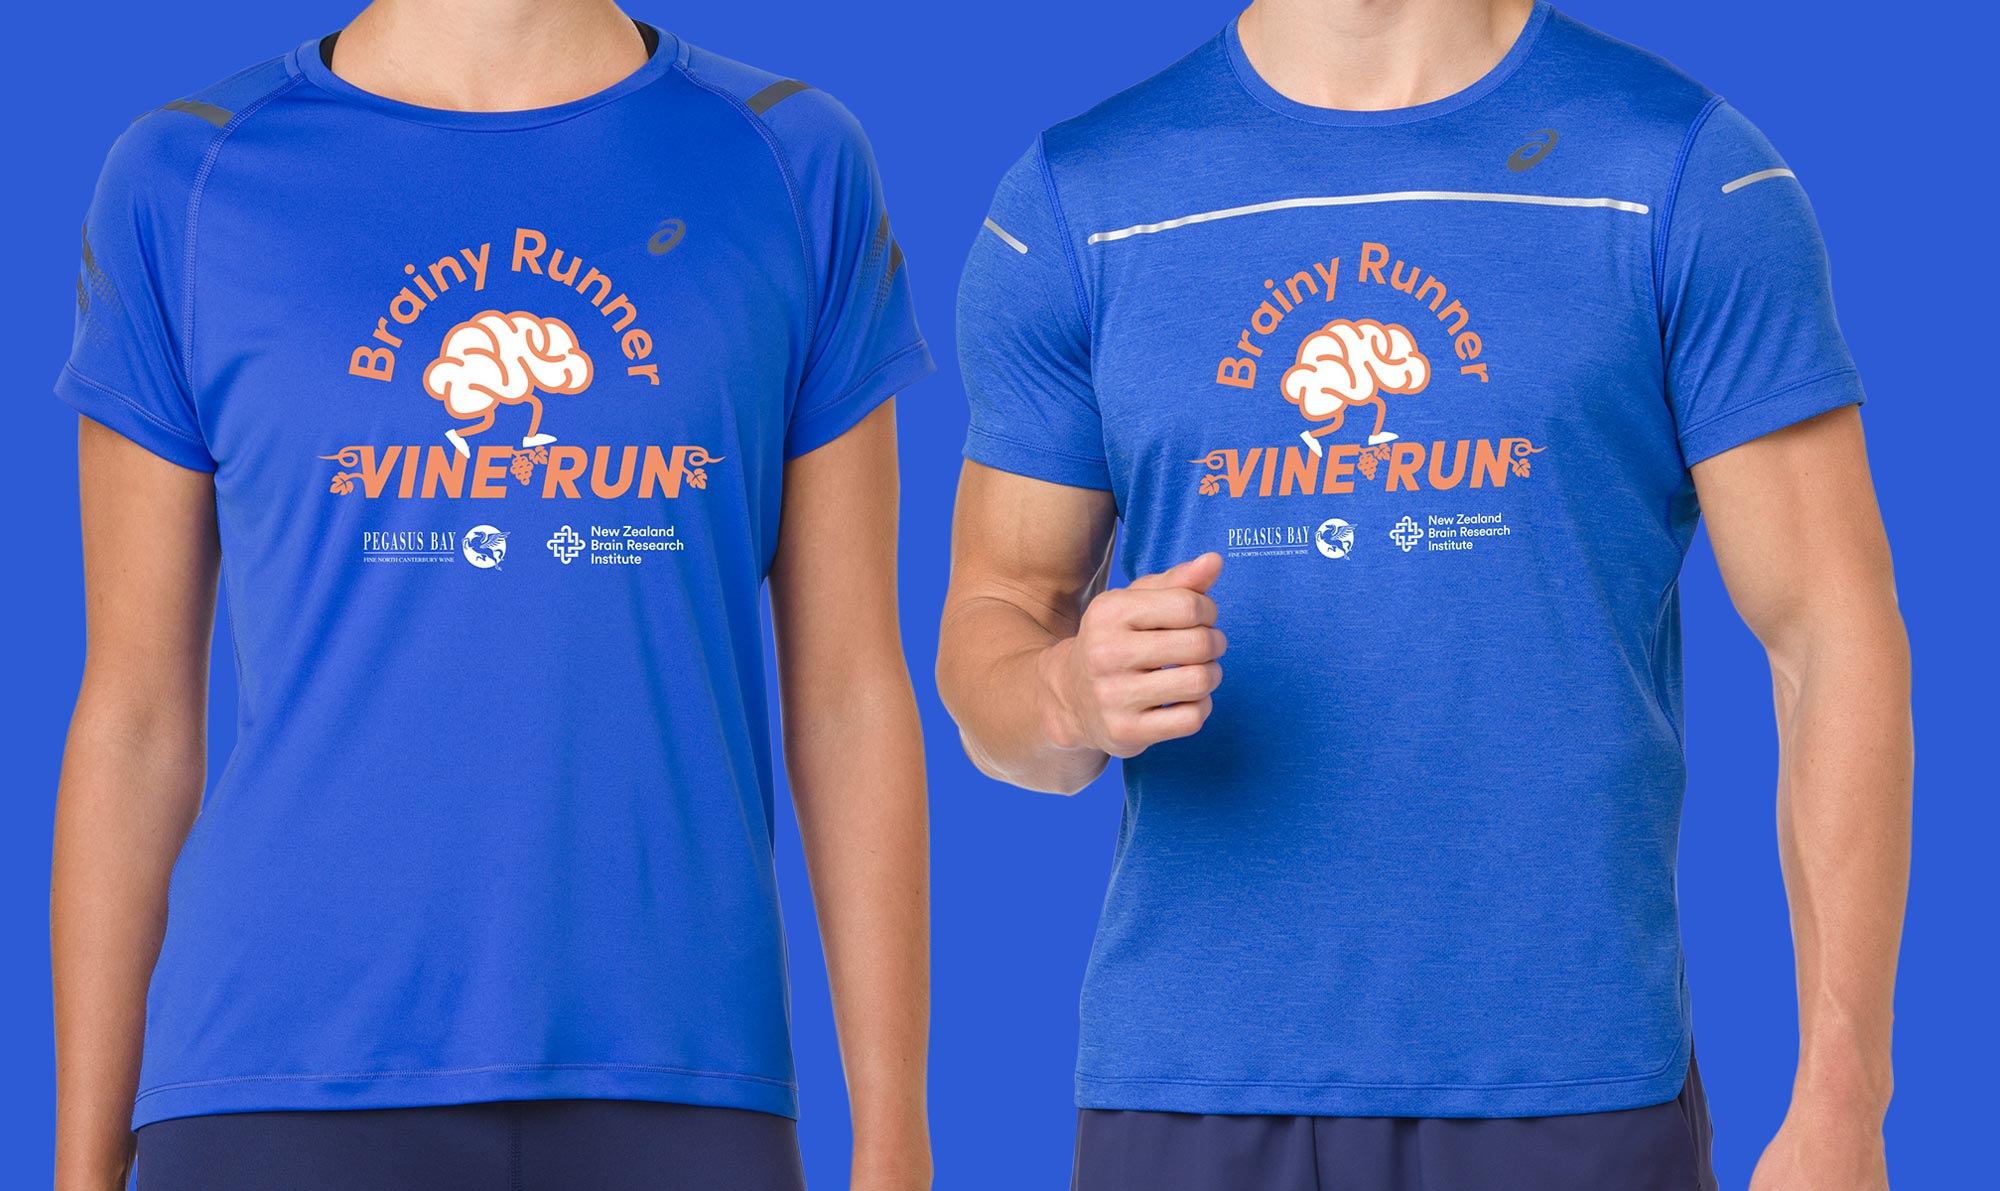 Pegasus Bay Vine Run Brainy Runner tops